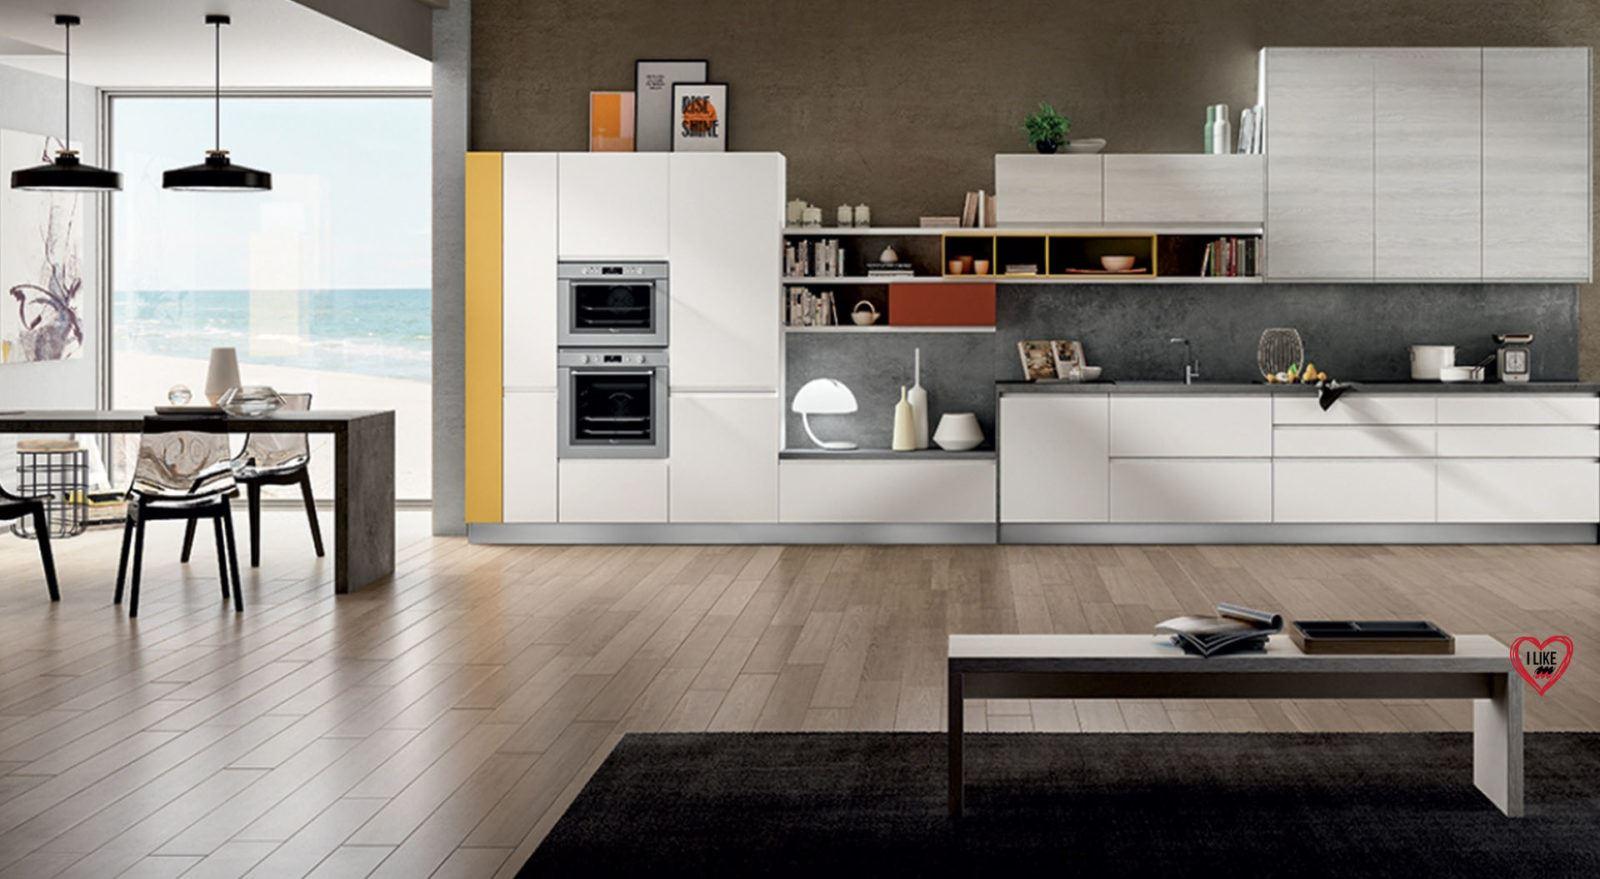 Cucine lineari moderne padova anche in offerta - Comporre la cucina ...